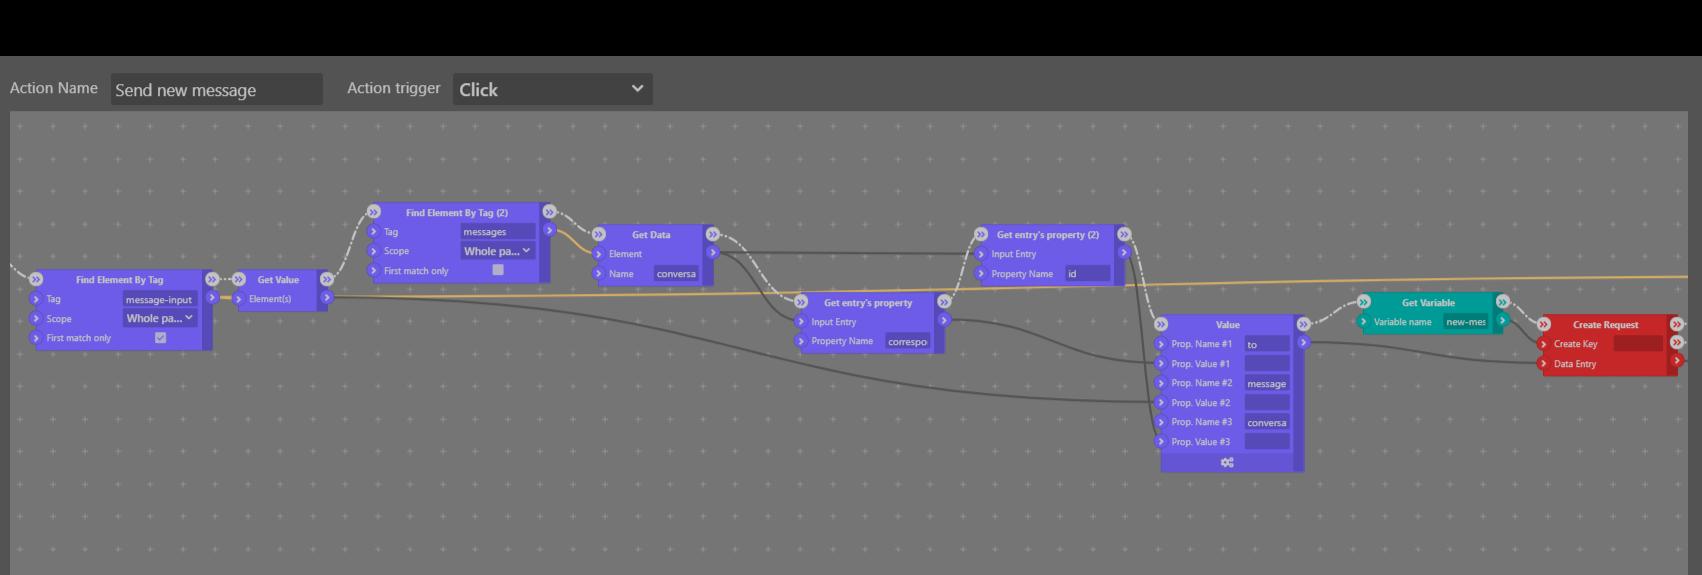 Send Action Workflow - Sktch.io No-Code Builder